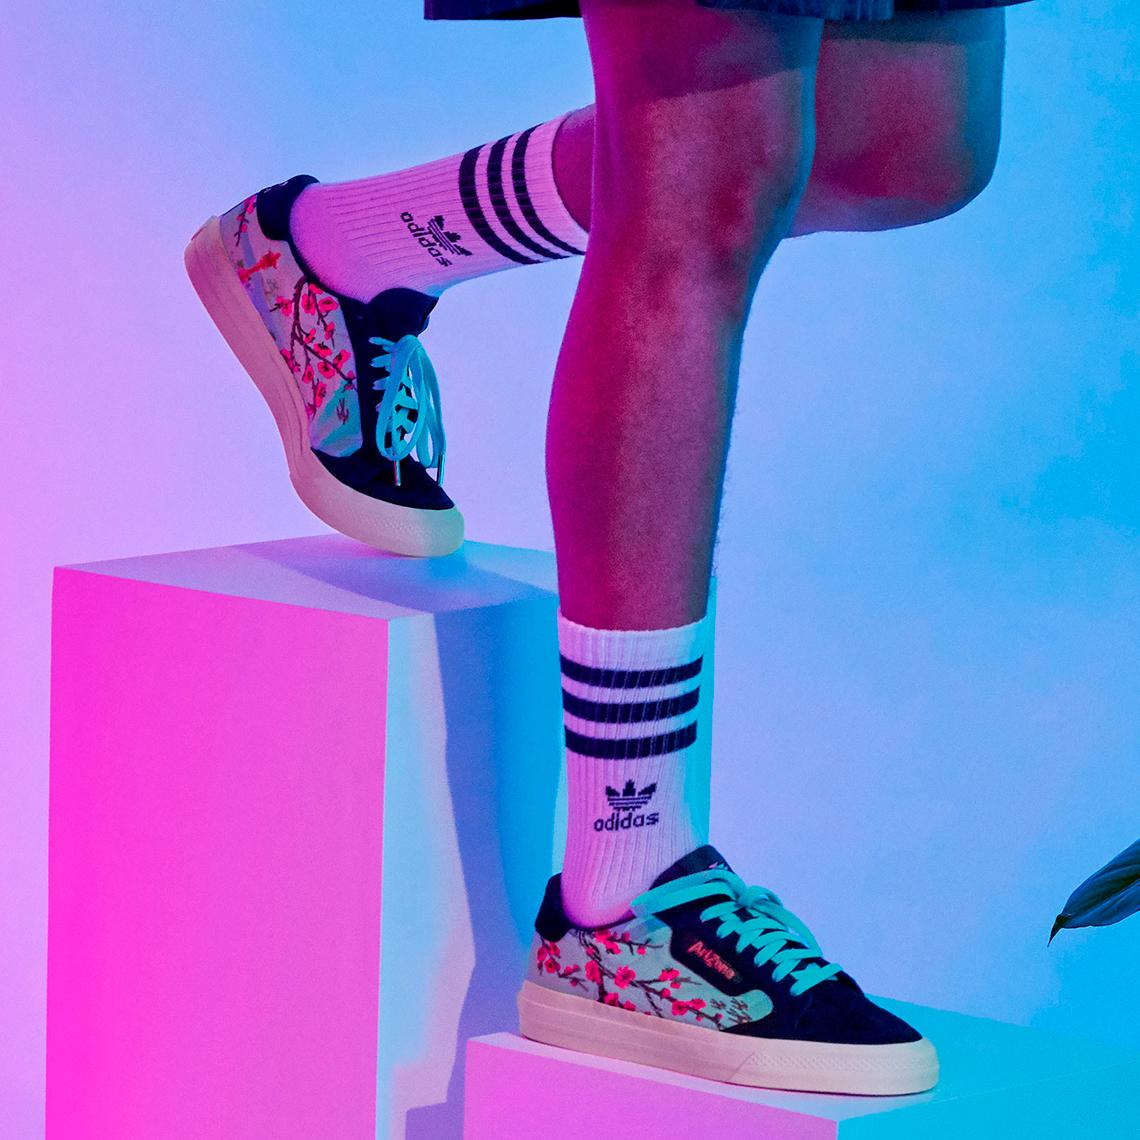 Adidas-AriZona-04